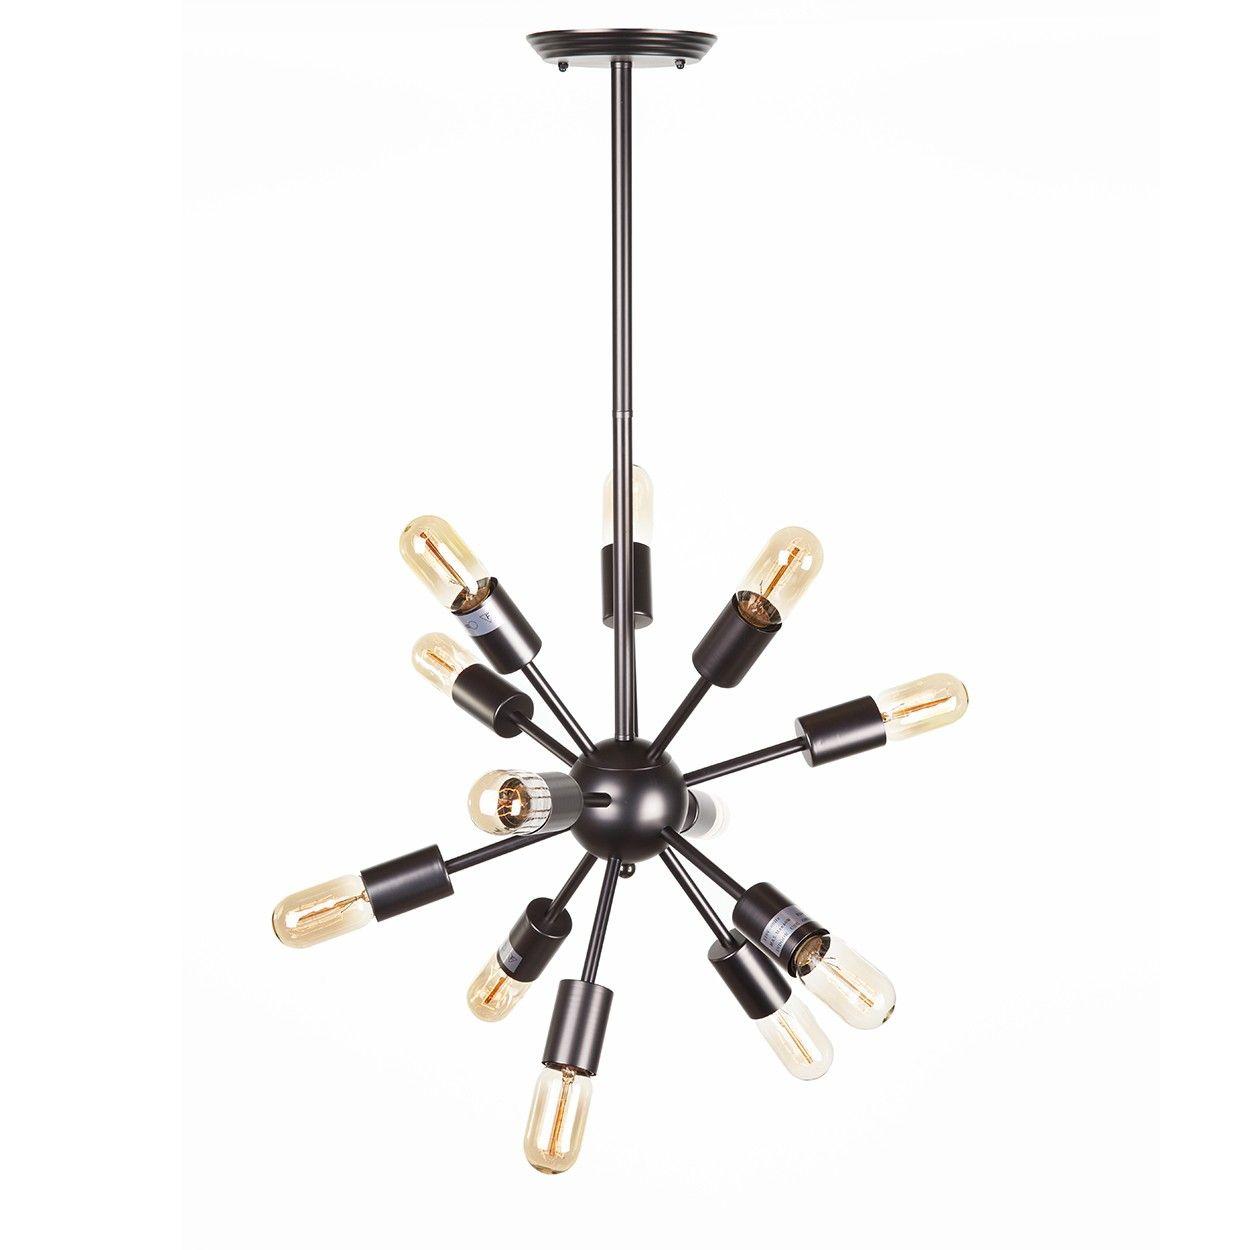 Lennox chandelier small lizs apt inspirtation pinterest lennox chandelier small arubaitofo Images